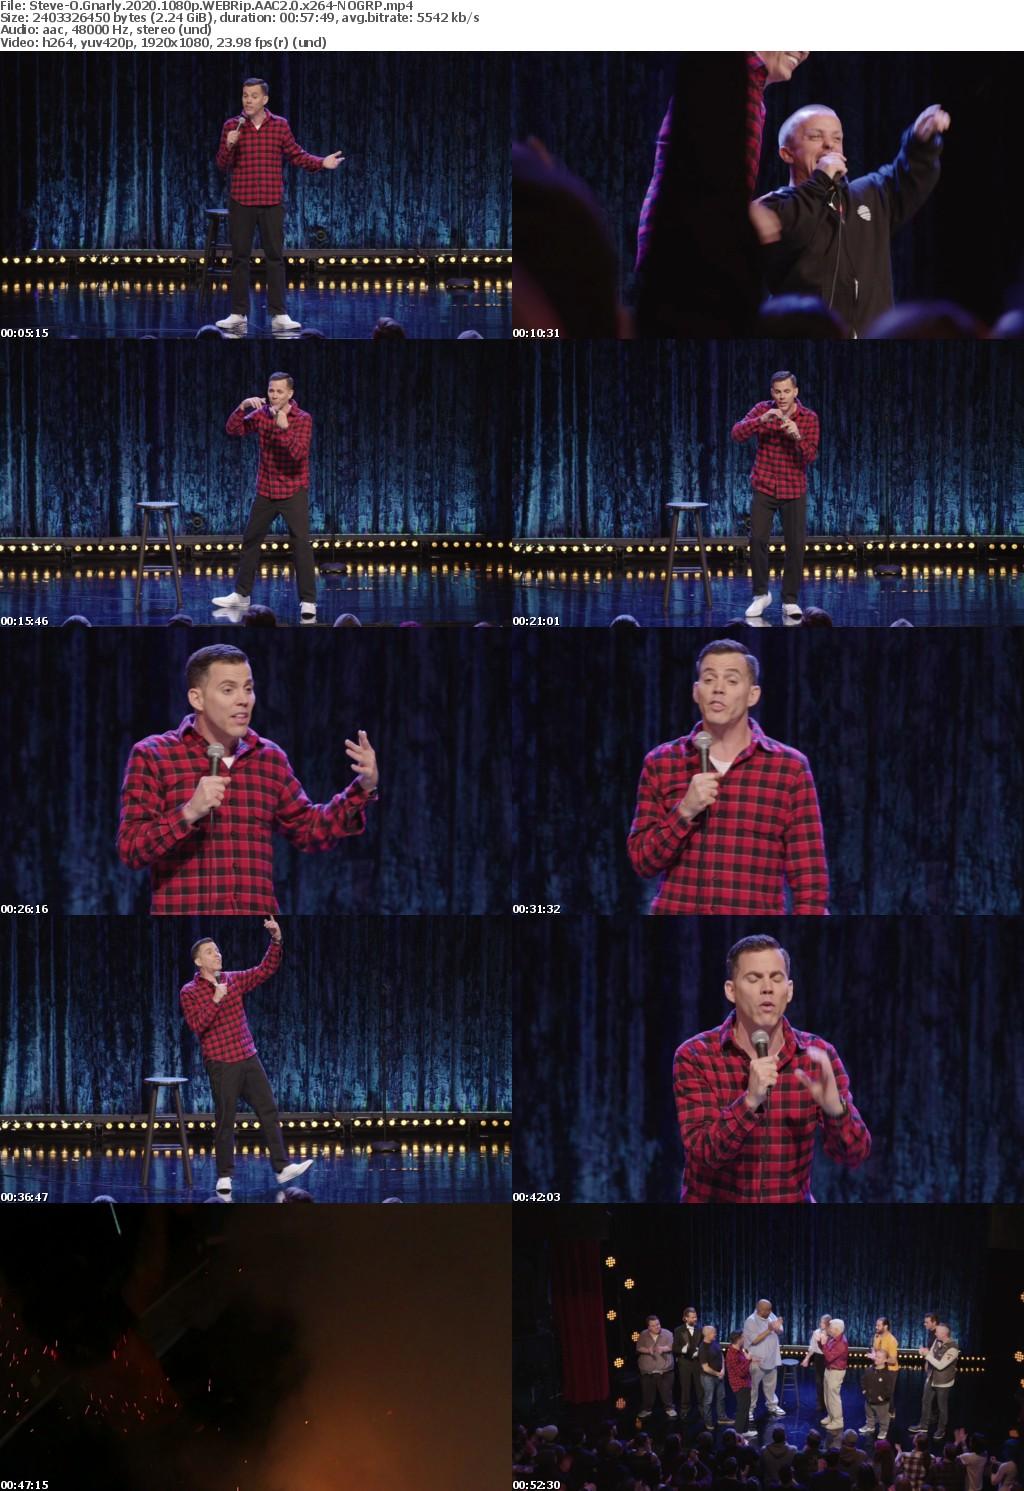 Steve-O Gnarly 2020 1080p WEBRip AAC2 0 x264-NOGRP